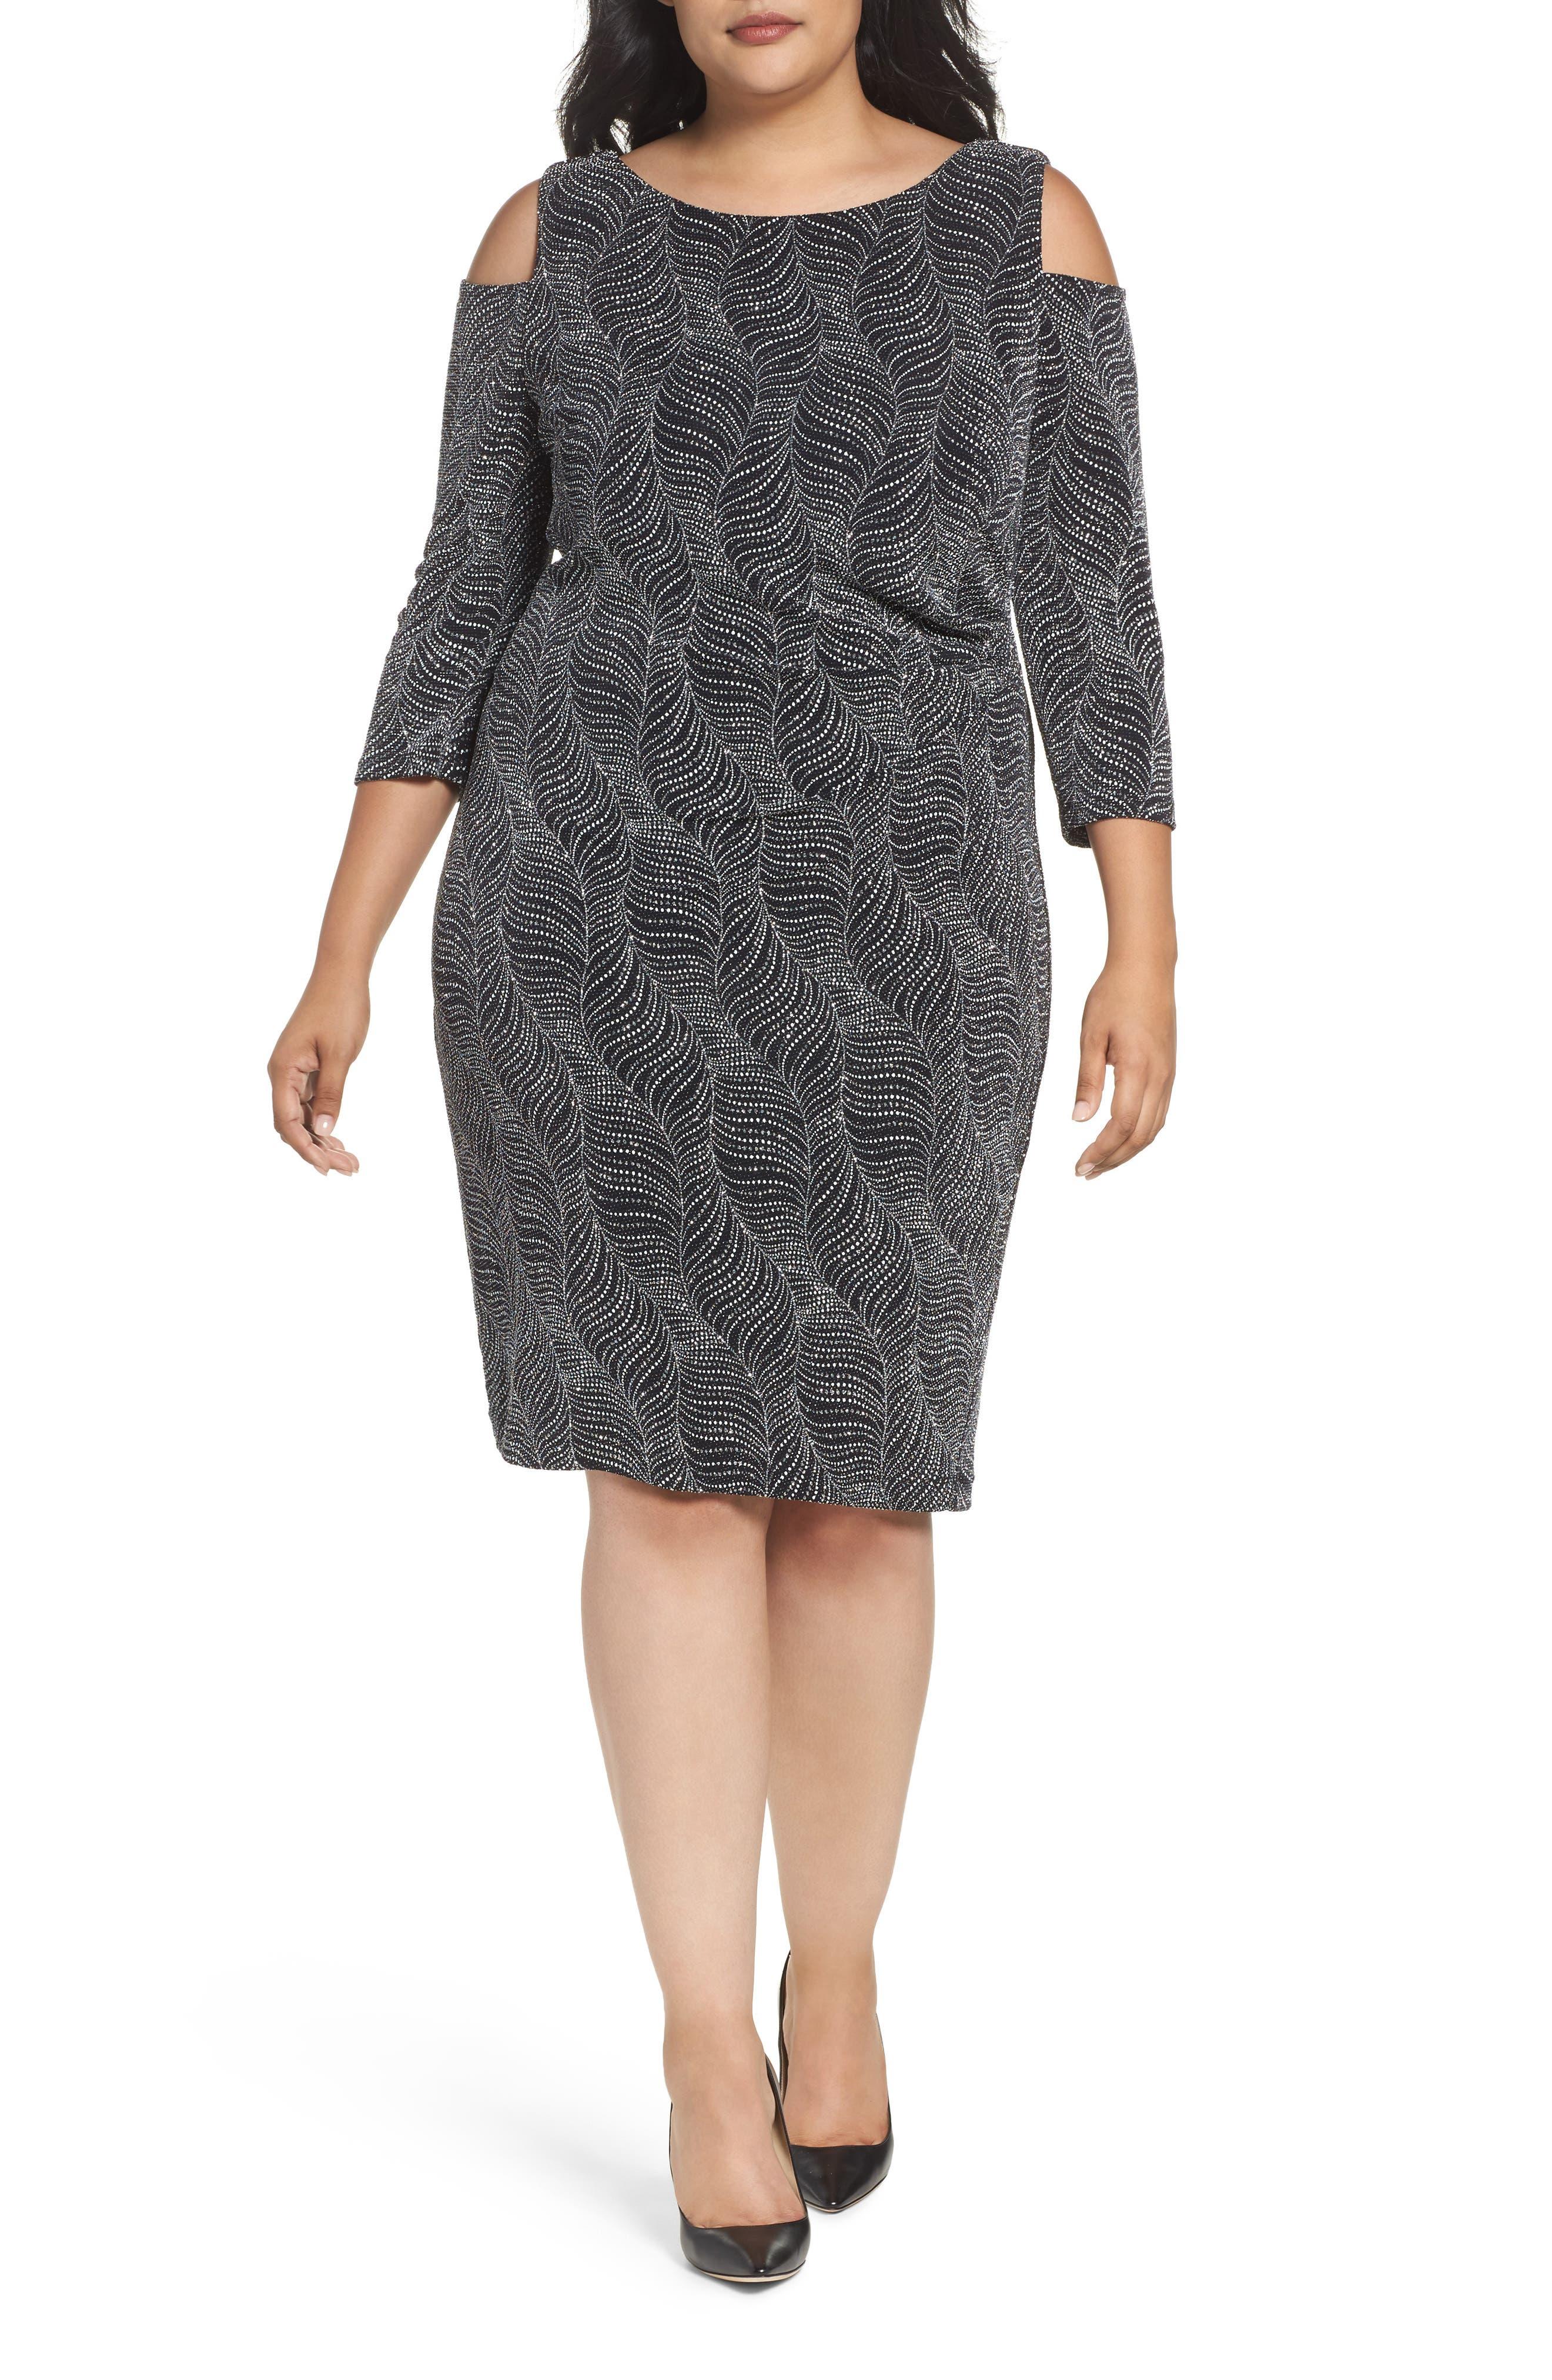 Cold Shoulder Glitter Knit Sheath Dress,                             Main thumbnail 1, color,                             Black/ Silver